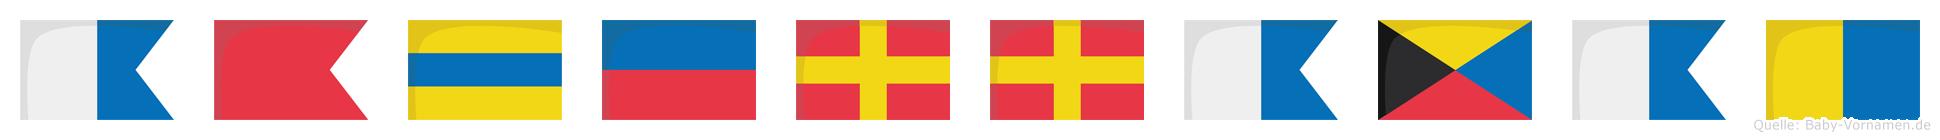 Abderrazak im Flaggenalphabet